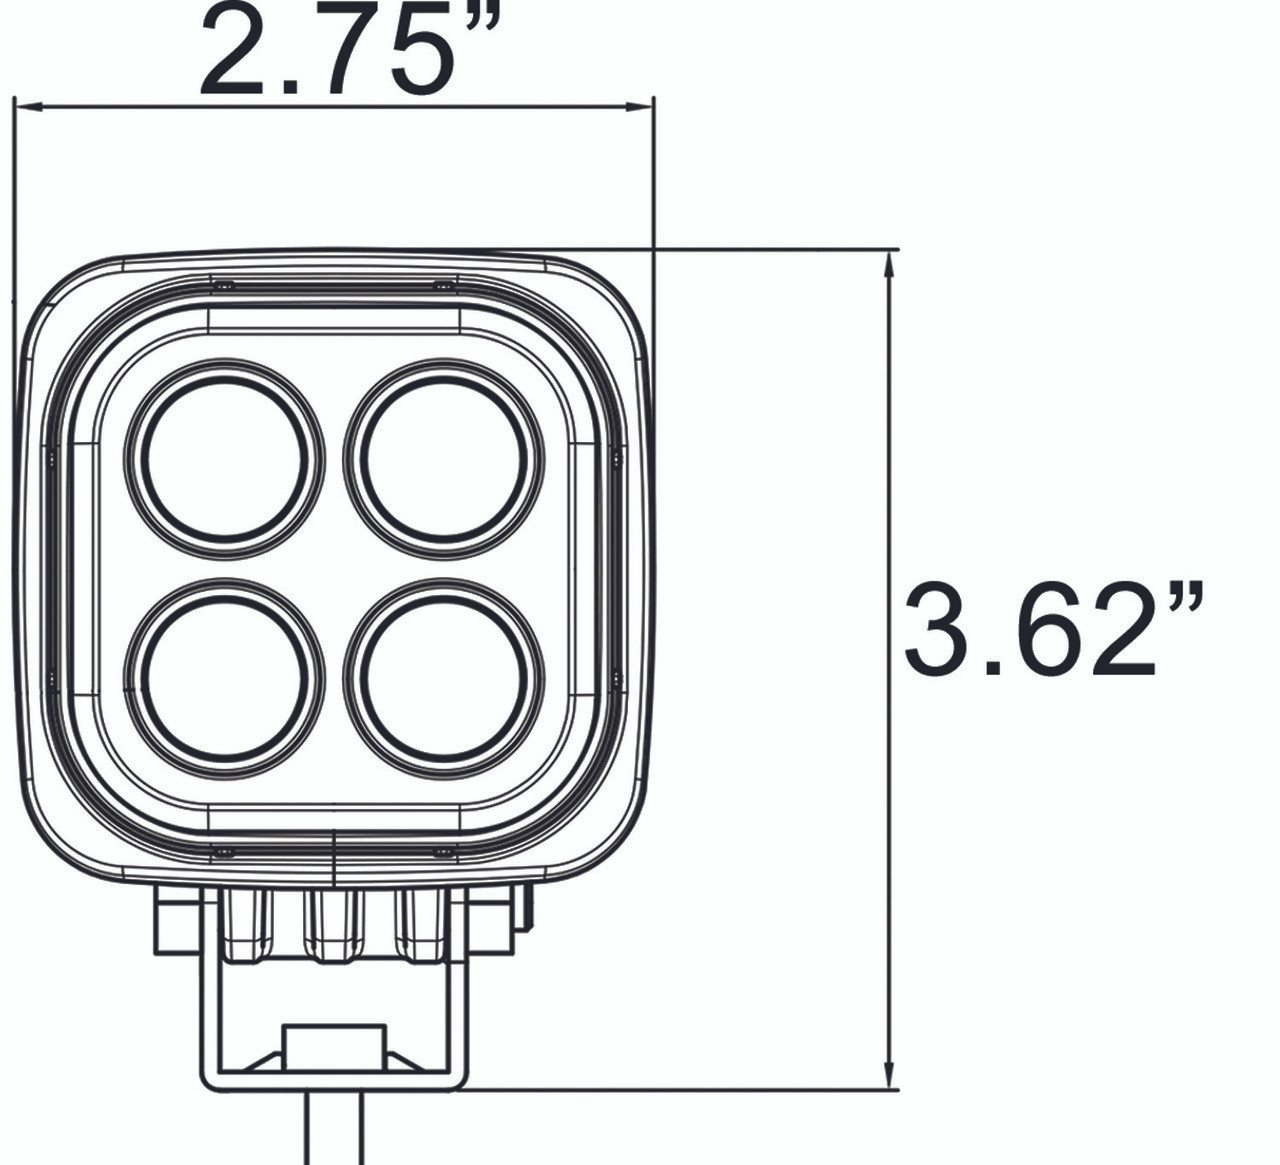 Dimensions of the Vision X Dura Mini LED Light